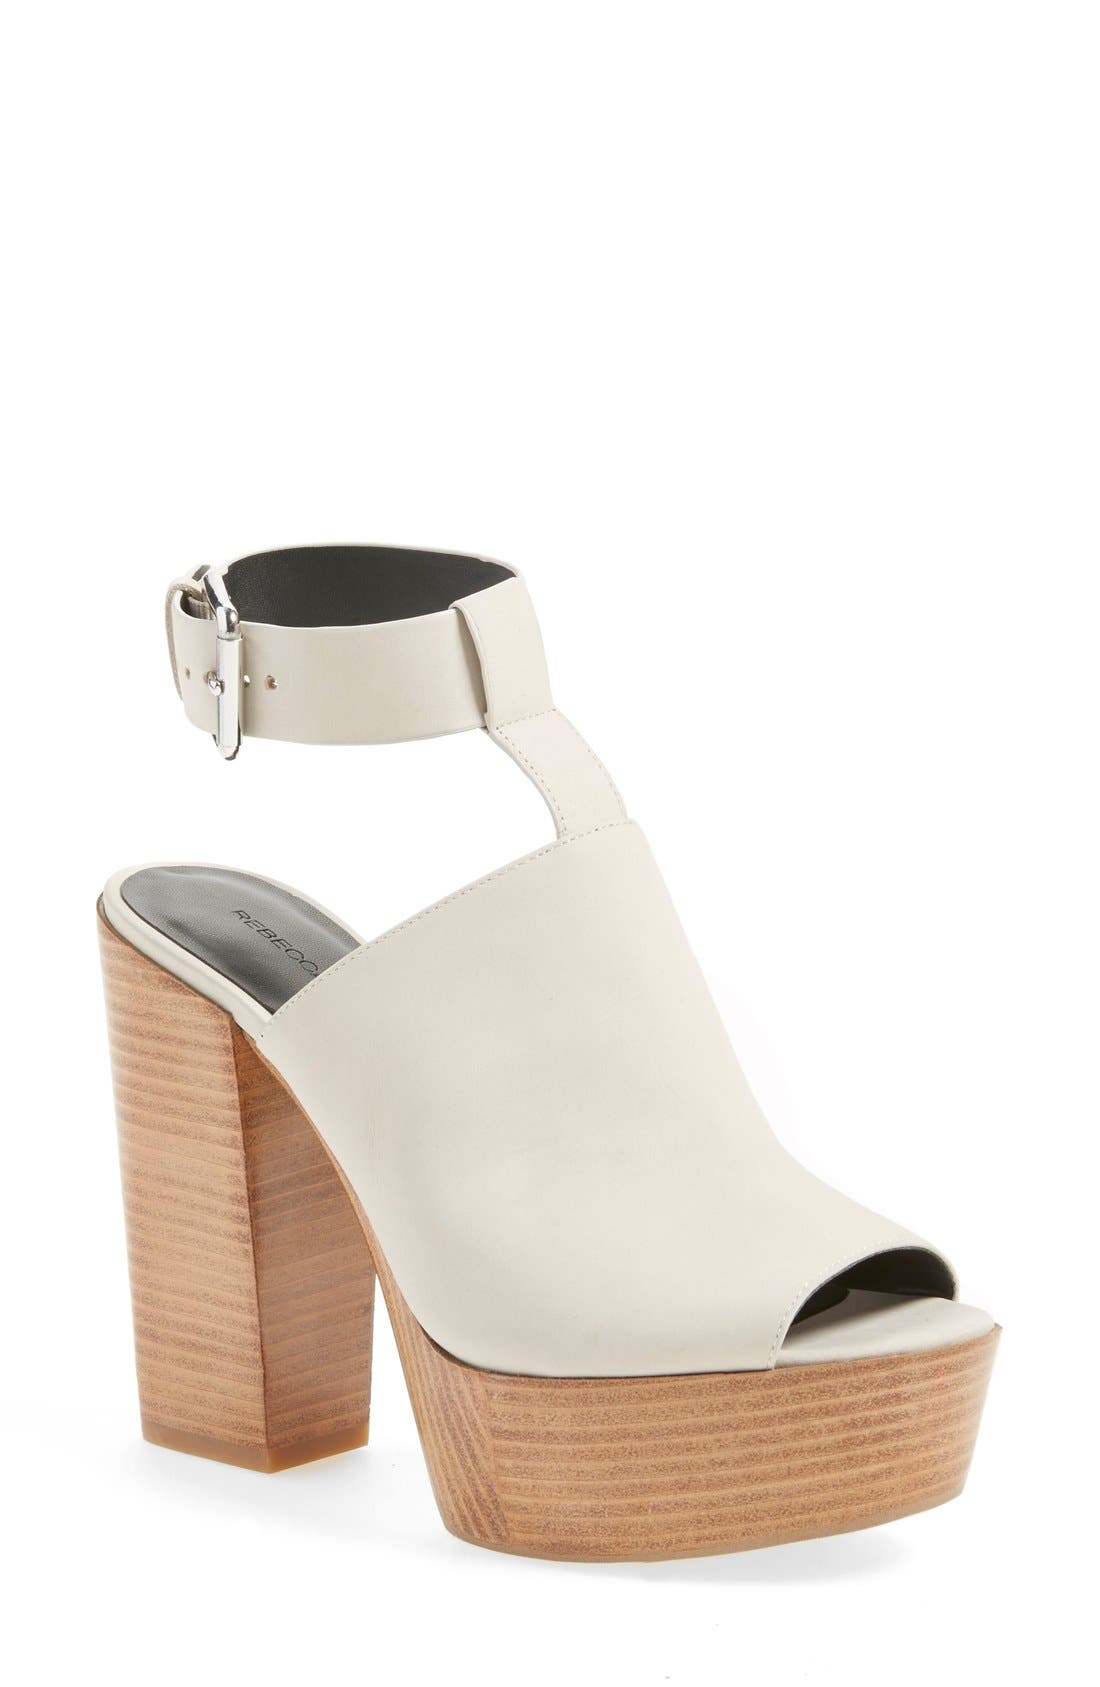 Alternate Image 1 Selected - Rebecca Minkoff 'Cece' Platform Sandal (Women)